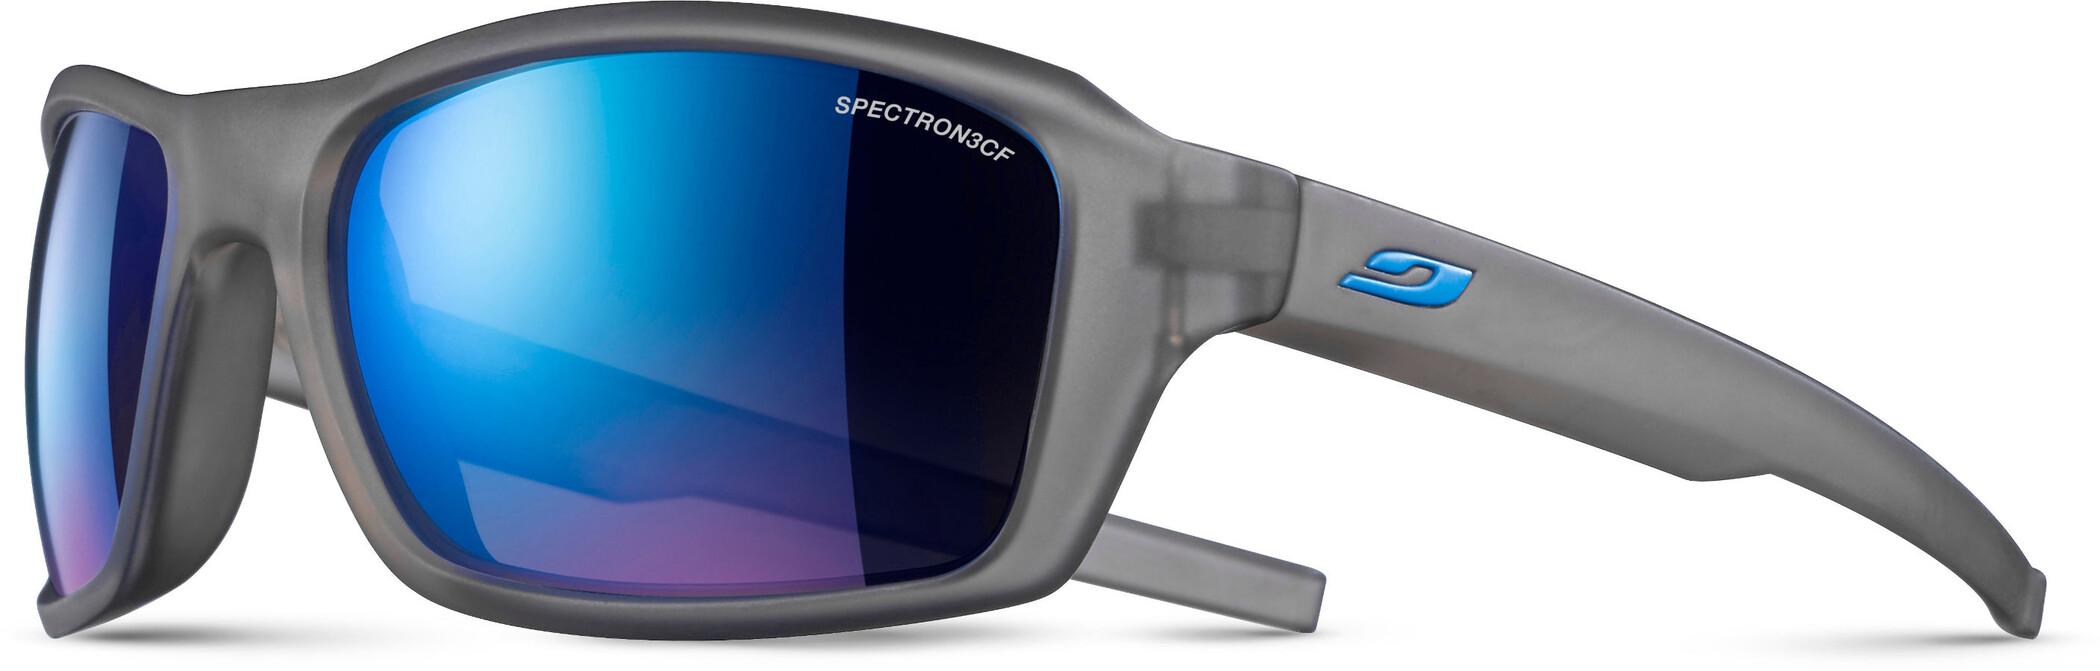 s www bikester ch orbea alma 29 h30 xt black 856135 html 2019julbo_extend_2_0_spectron_3cf_sunglasses_junior_8 12y_translucent_gray_blue multilayer_blue jpg